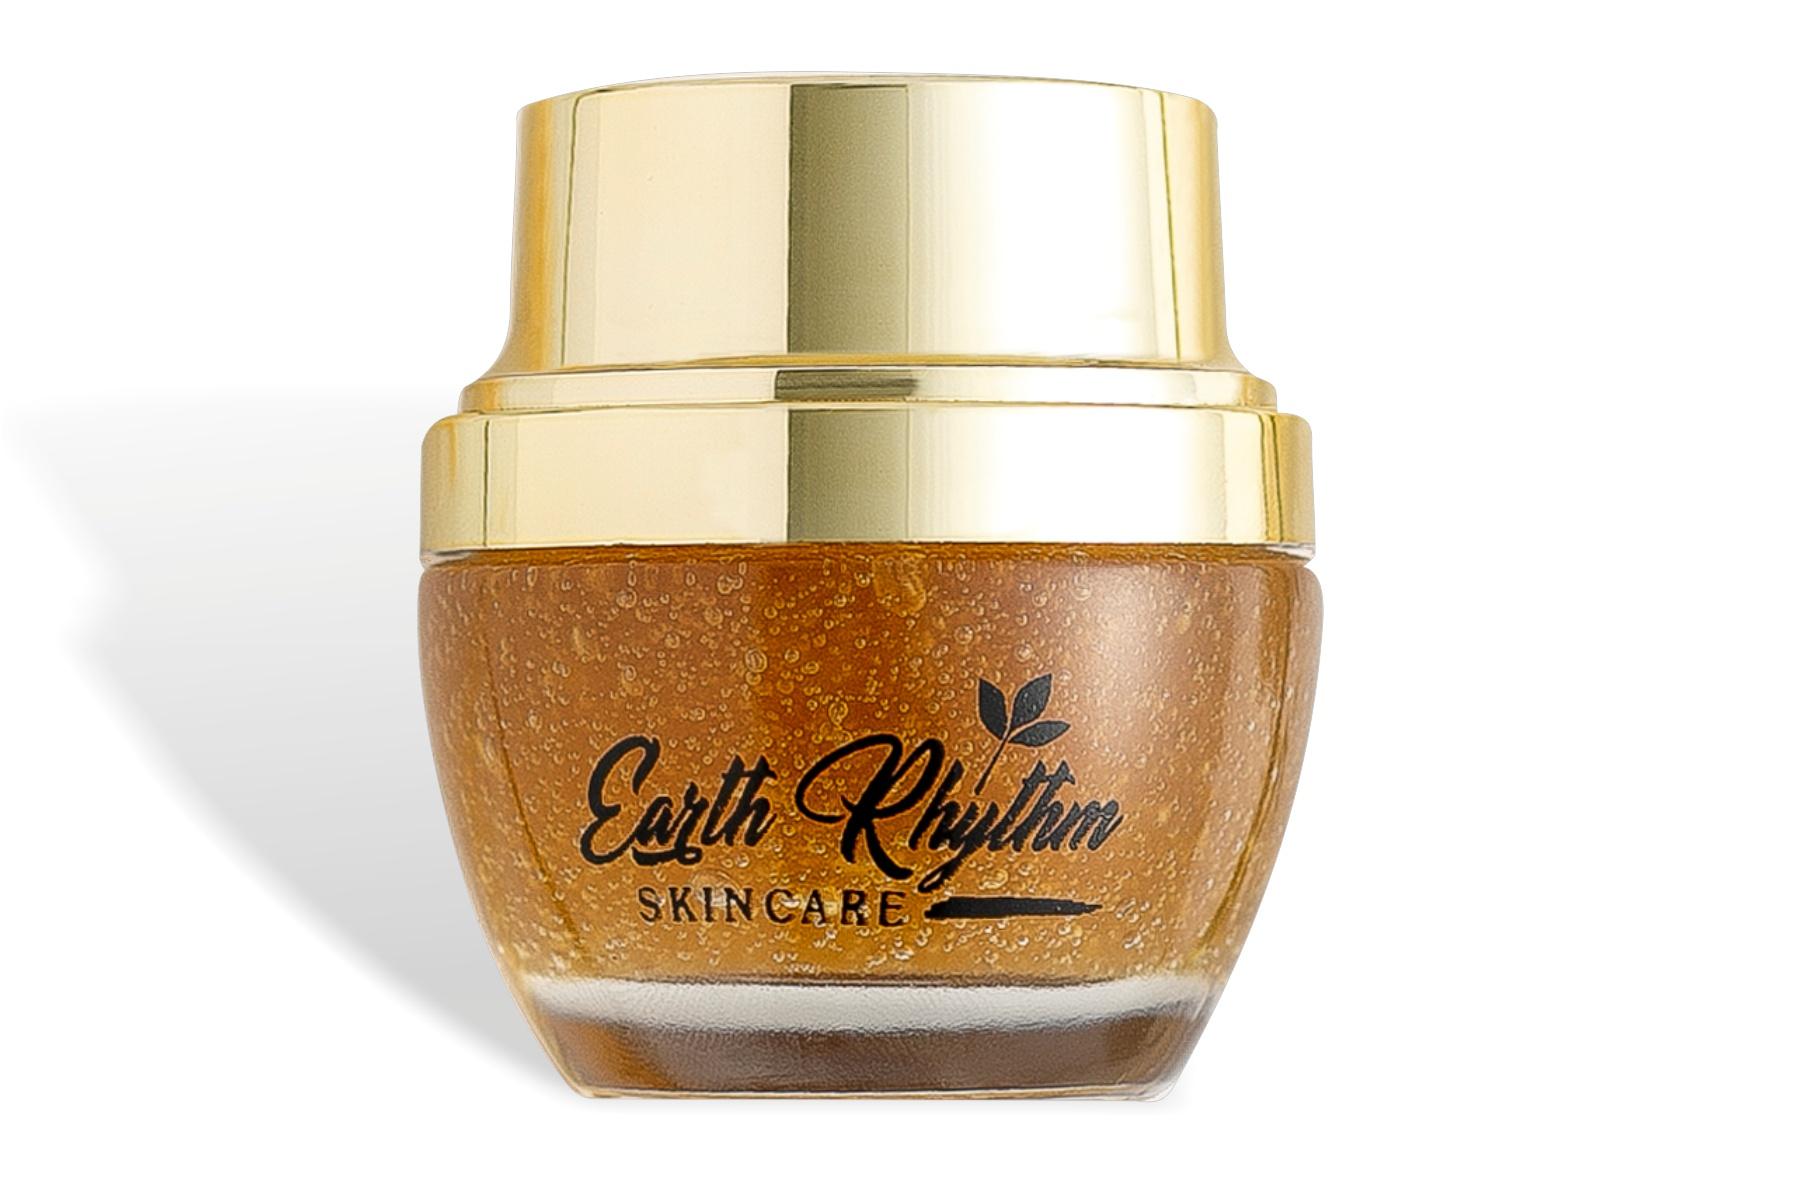 Earth Rhythm Propolis Face And Body Balm